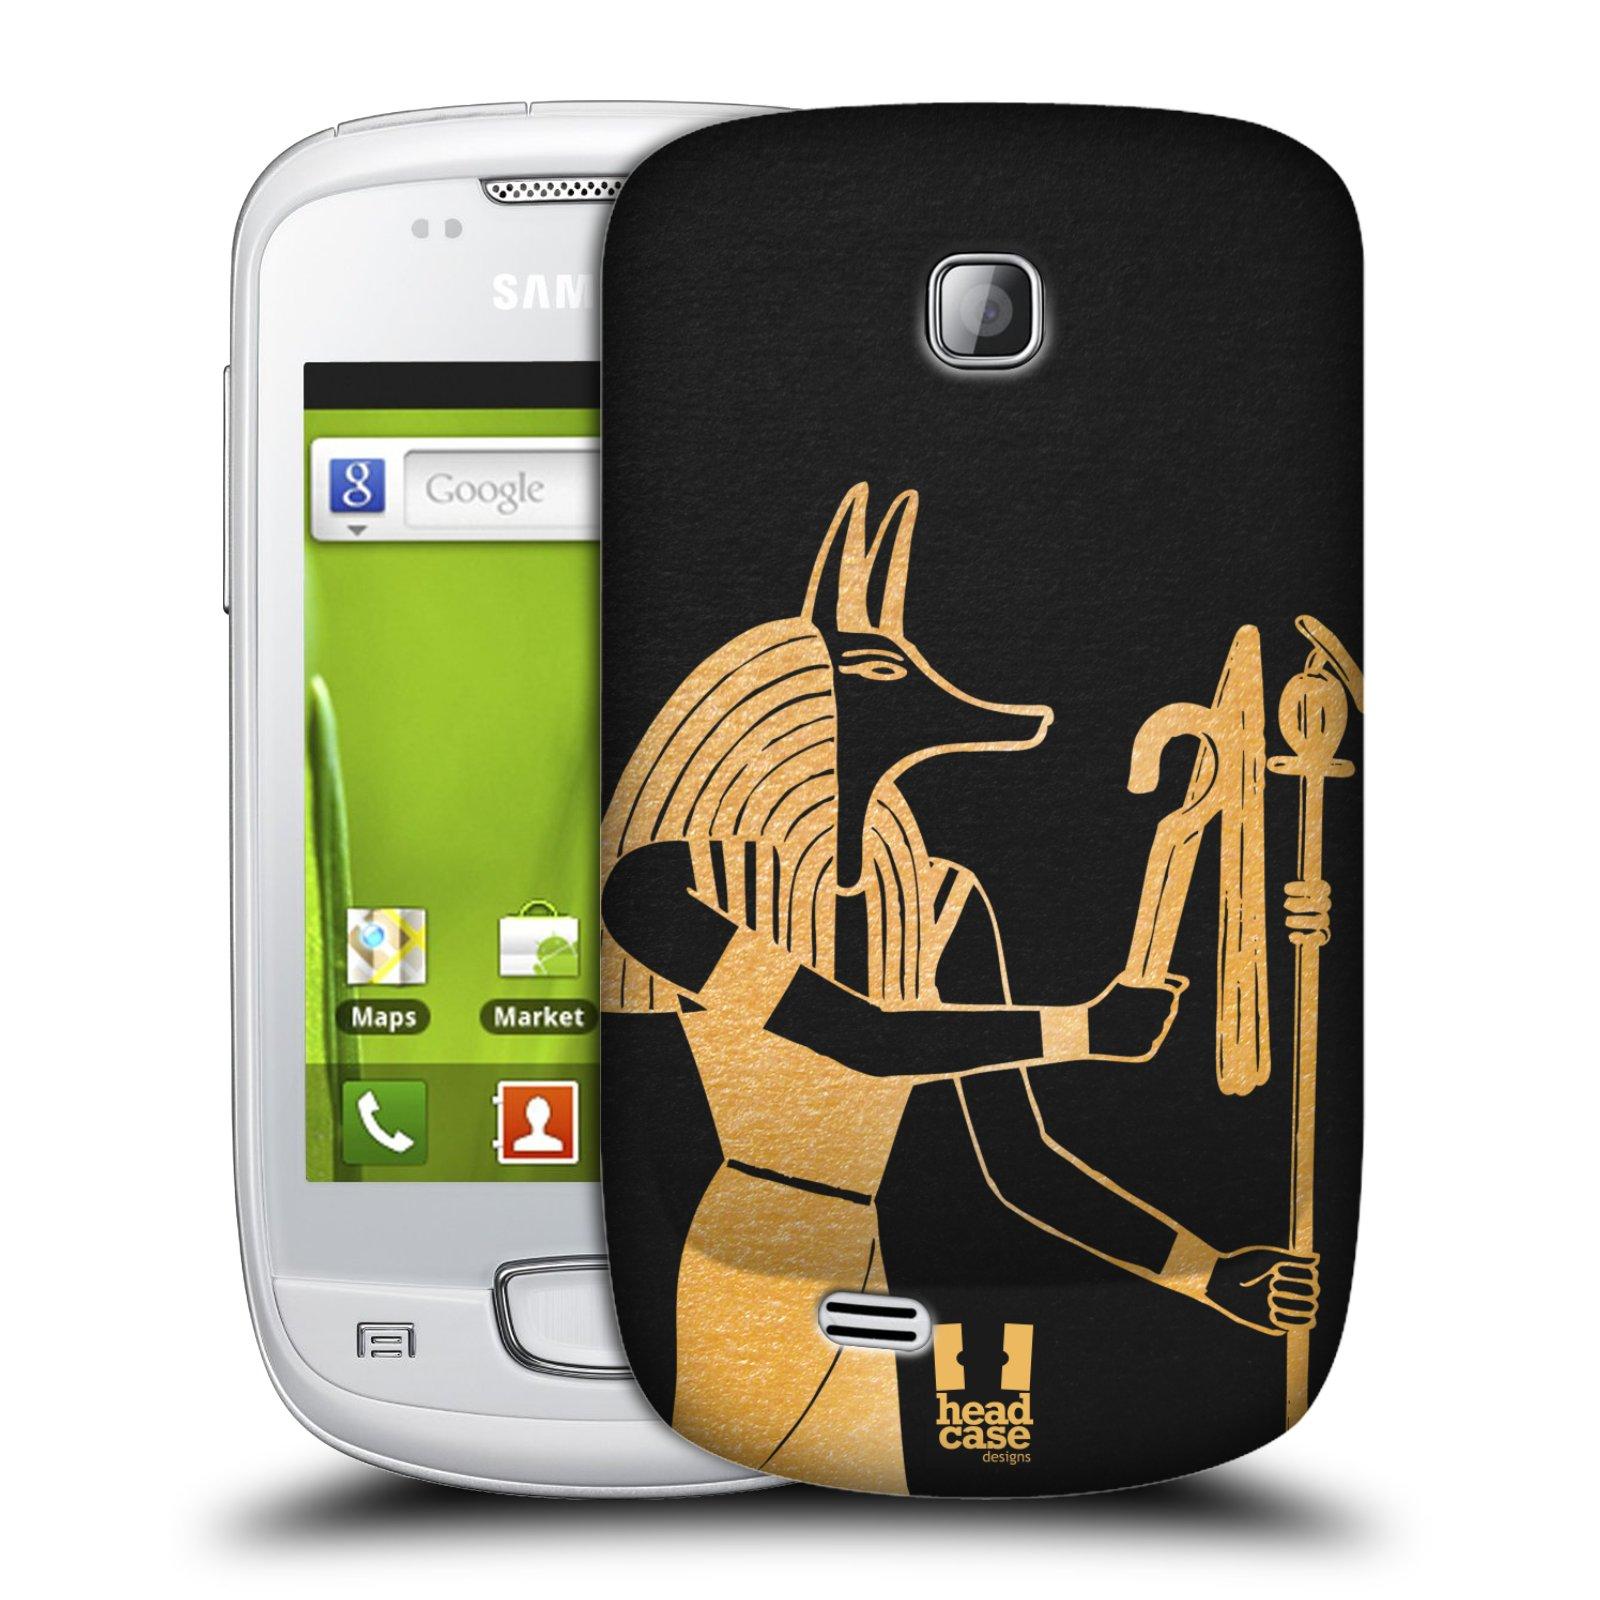 Plastové pouzdro na mobil Samsung Galaxy Mini HEAD CASE EGYPT ANUBIS (Kryt či obal na mobilní telefon Samsung Galaxy Mini GT-S5570 / GT-S5570i)